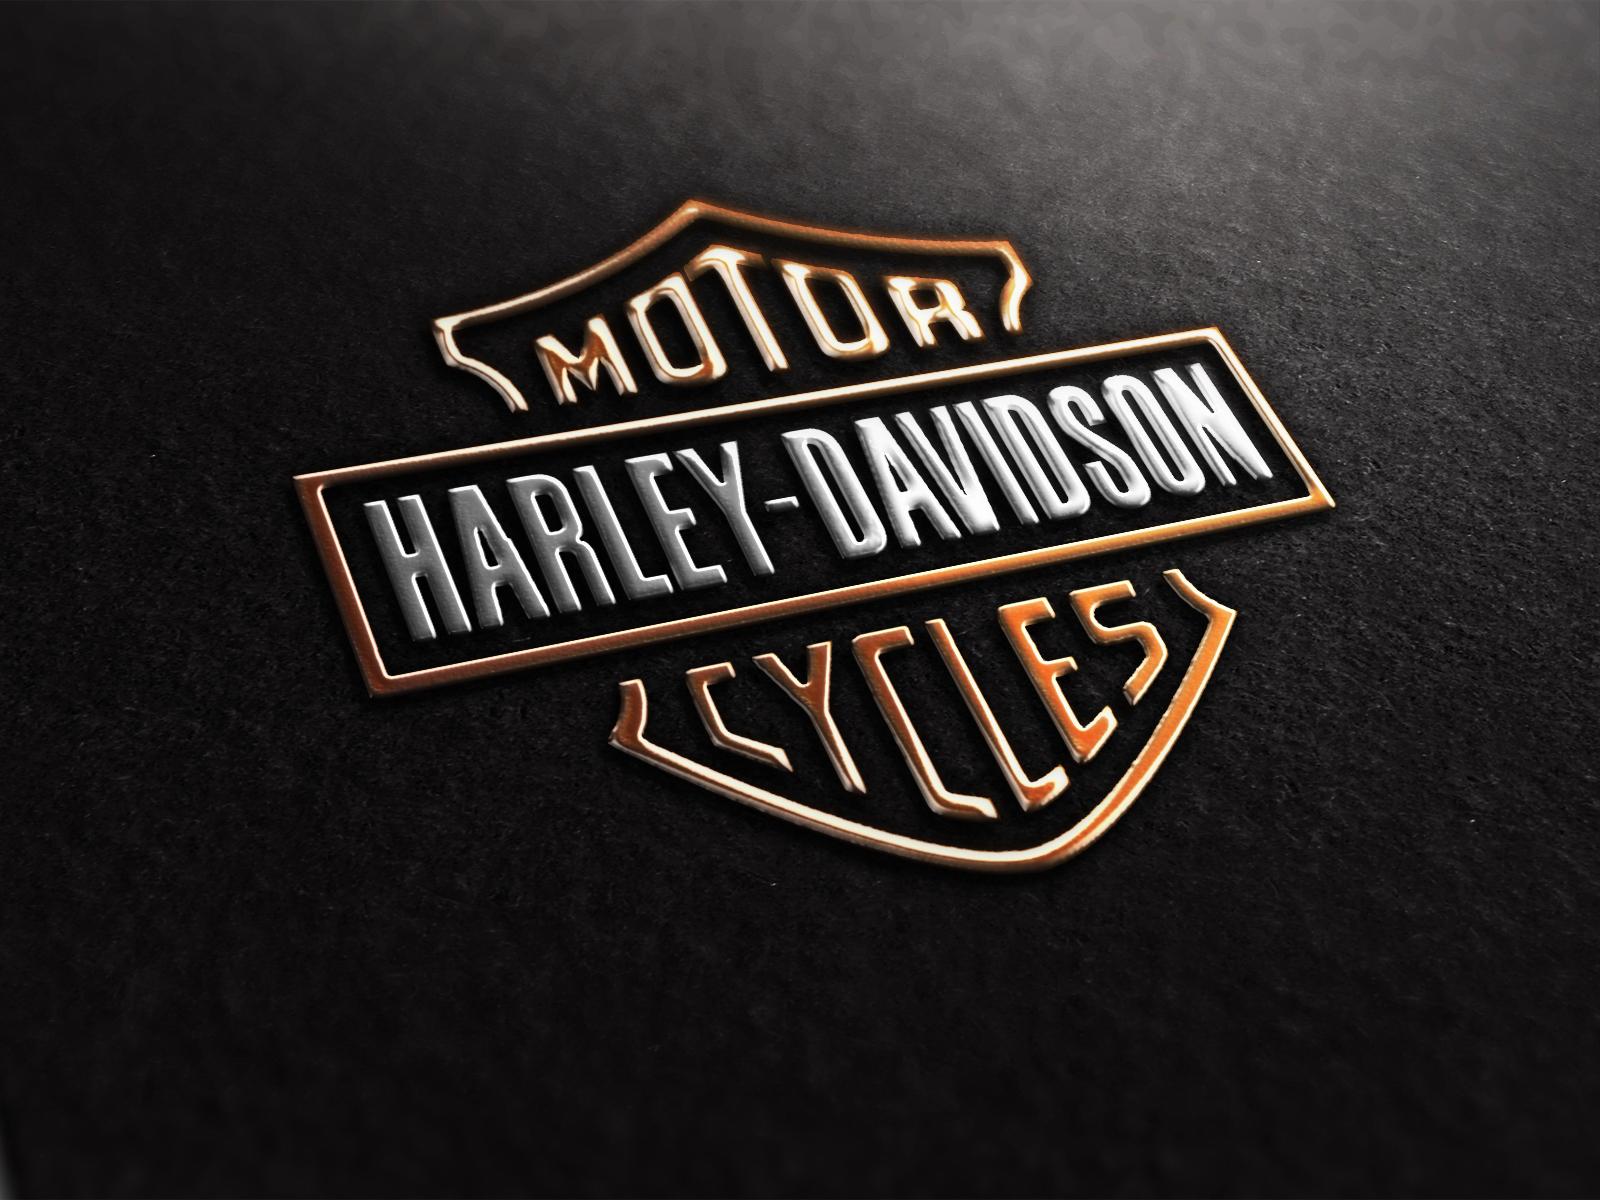 Harley Davidson Logo wallpapers Harley Davidson Logo stock photos 1600x1200